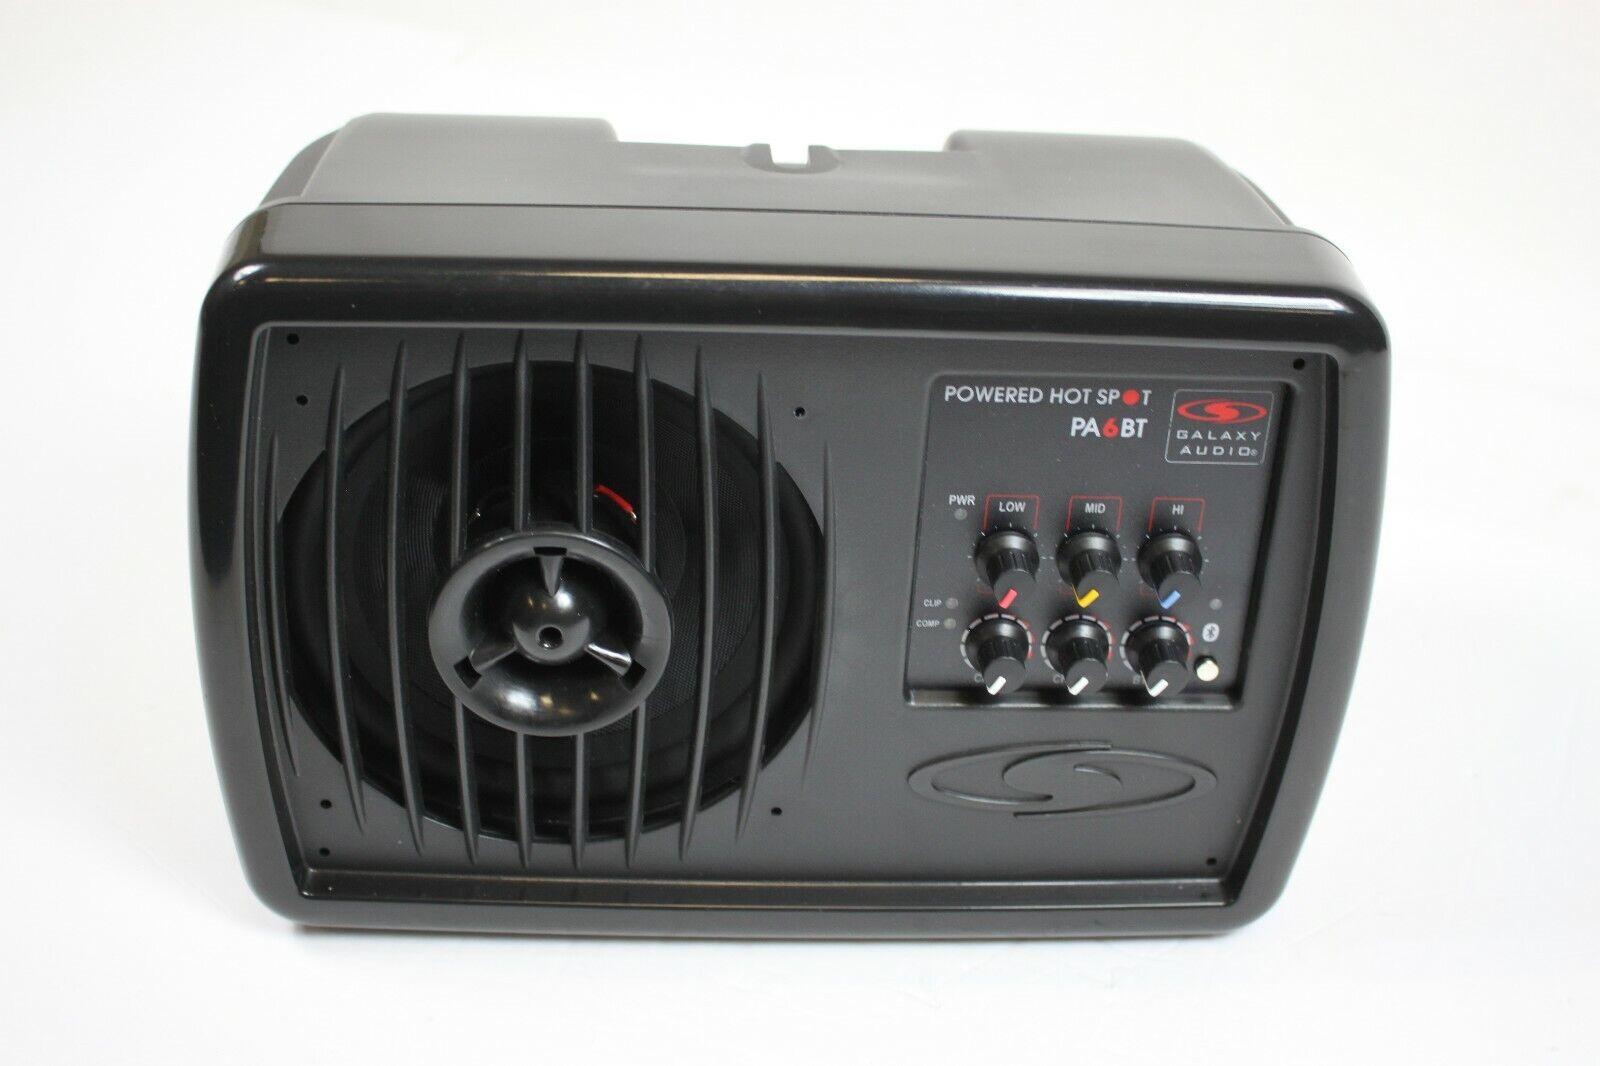 Galaxy Audio Powered Hot Spot Personal Monitor PA6BT- Parts or Repair #R7678